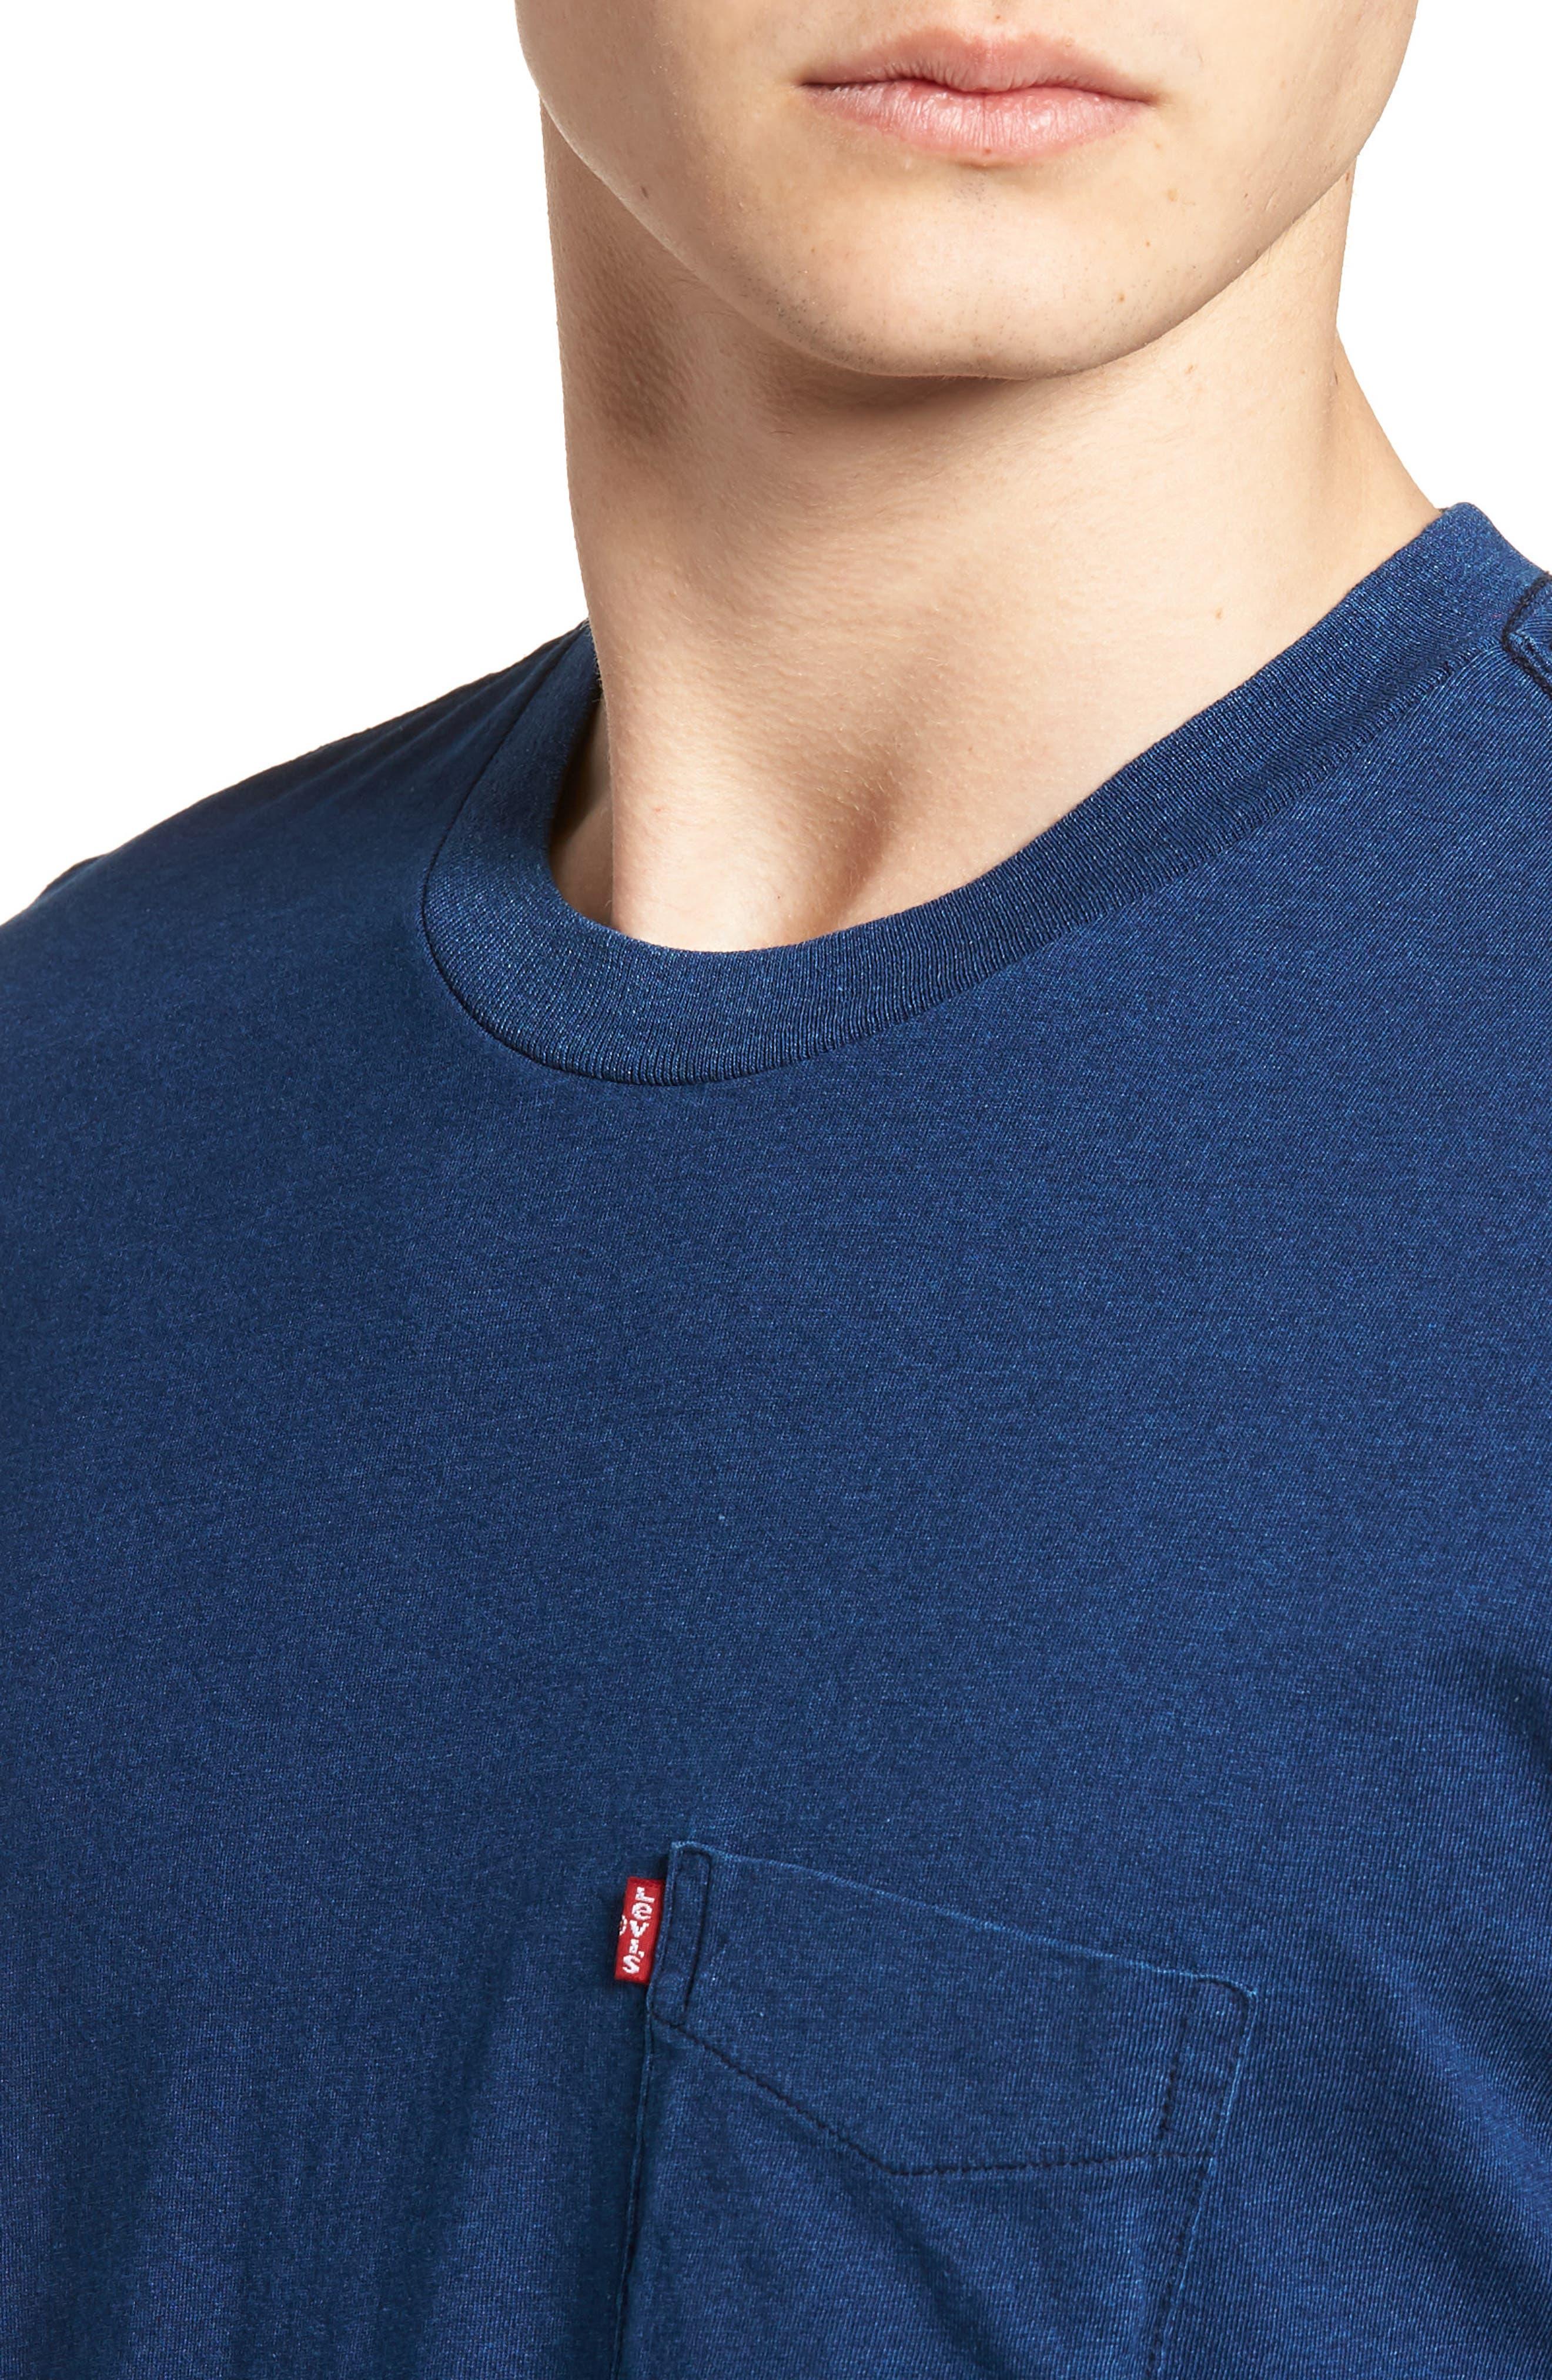 Pocket T-Shirt,                             Alternate thumbnail 4, color,                             Medium Indigo Xx